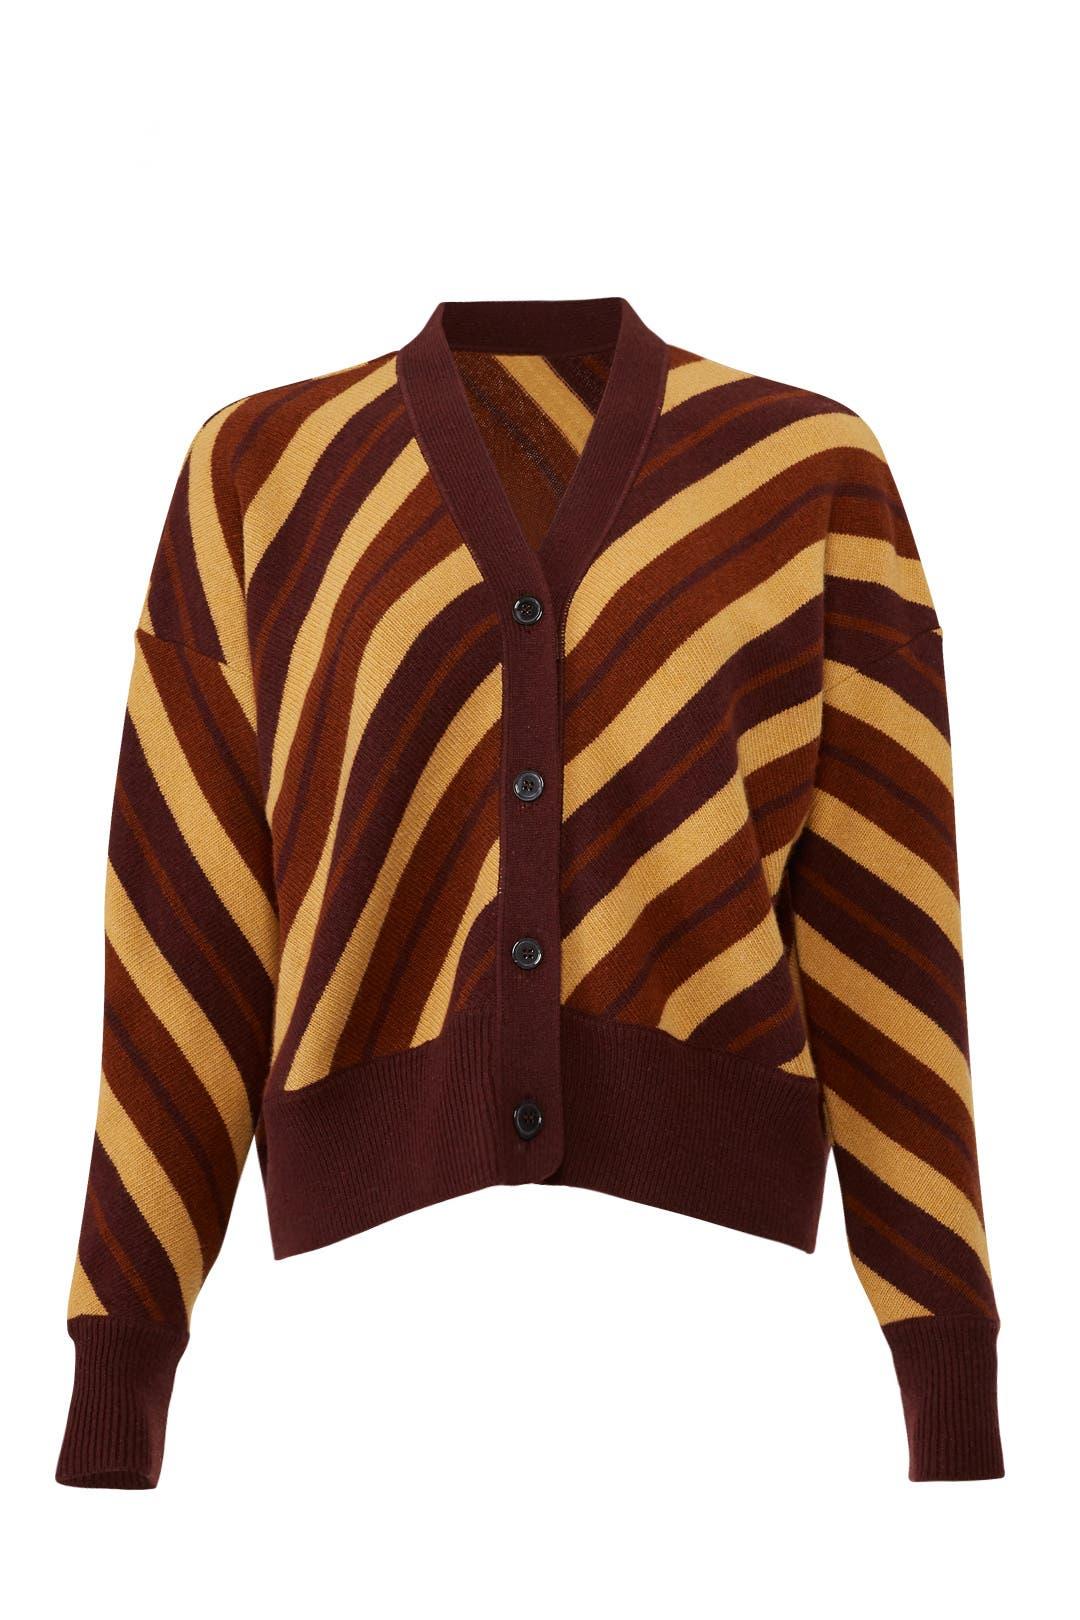 Marni Striped Long Sleeve Cardigan